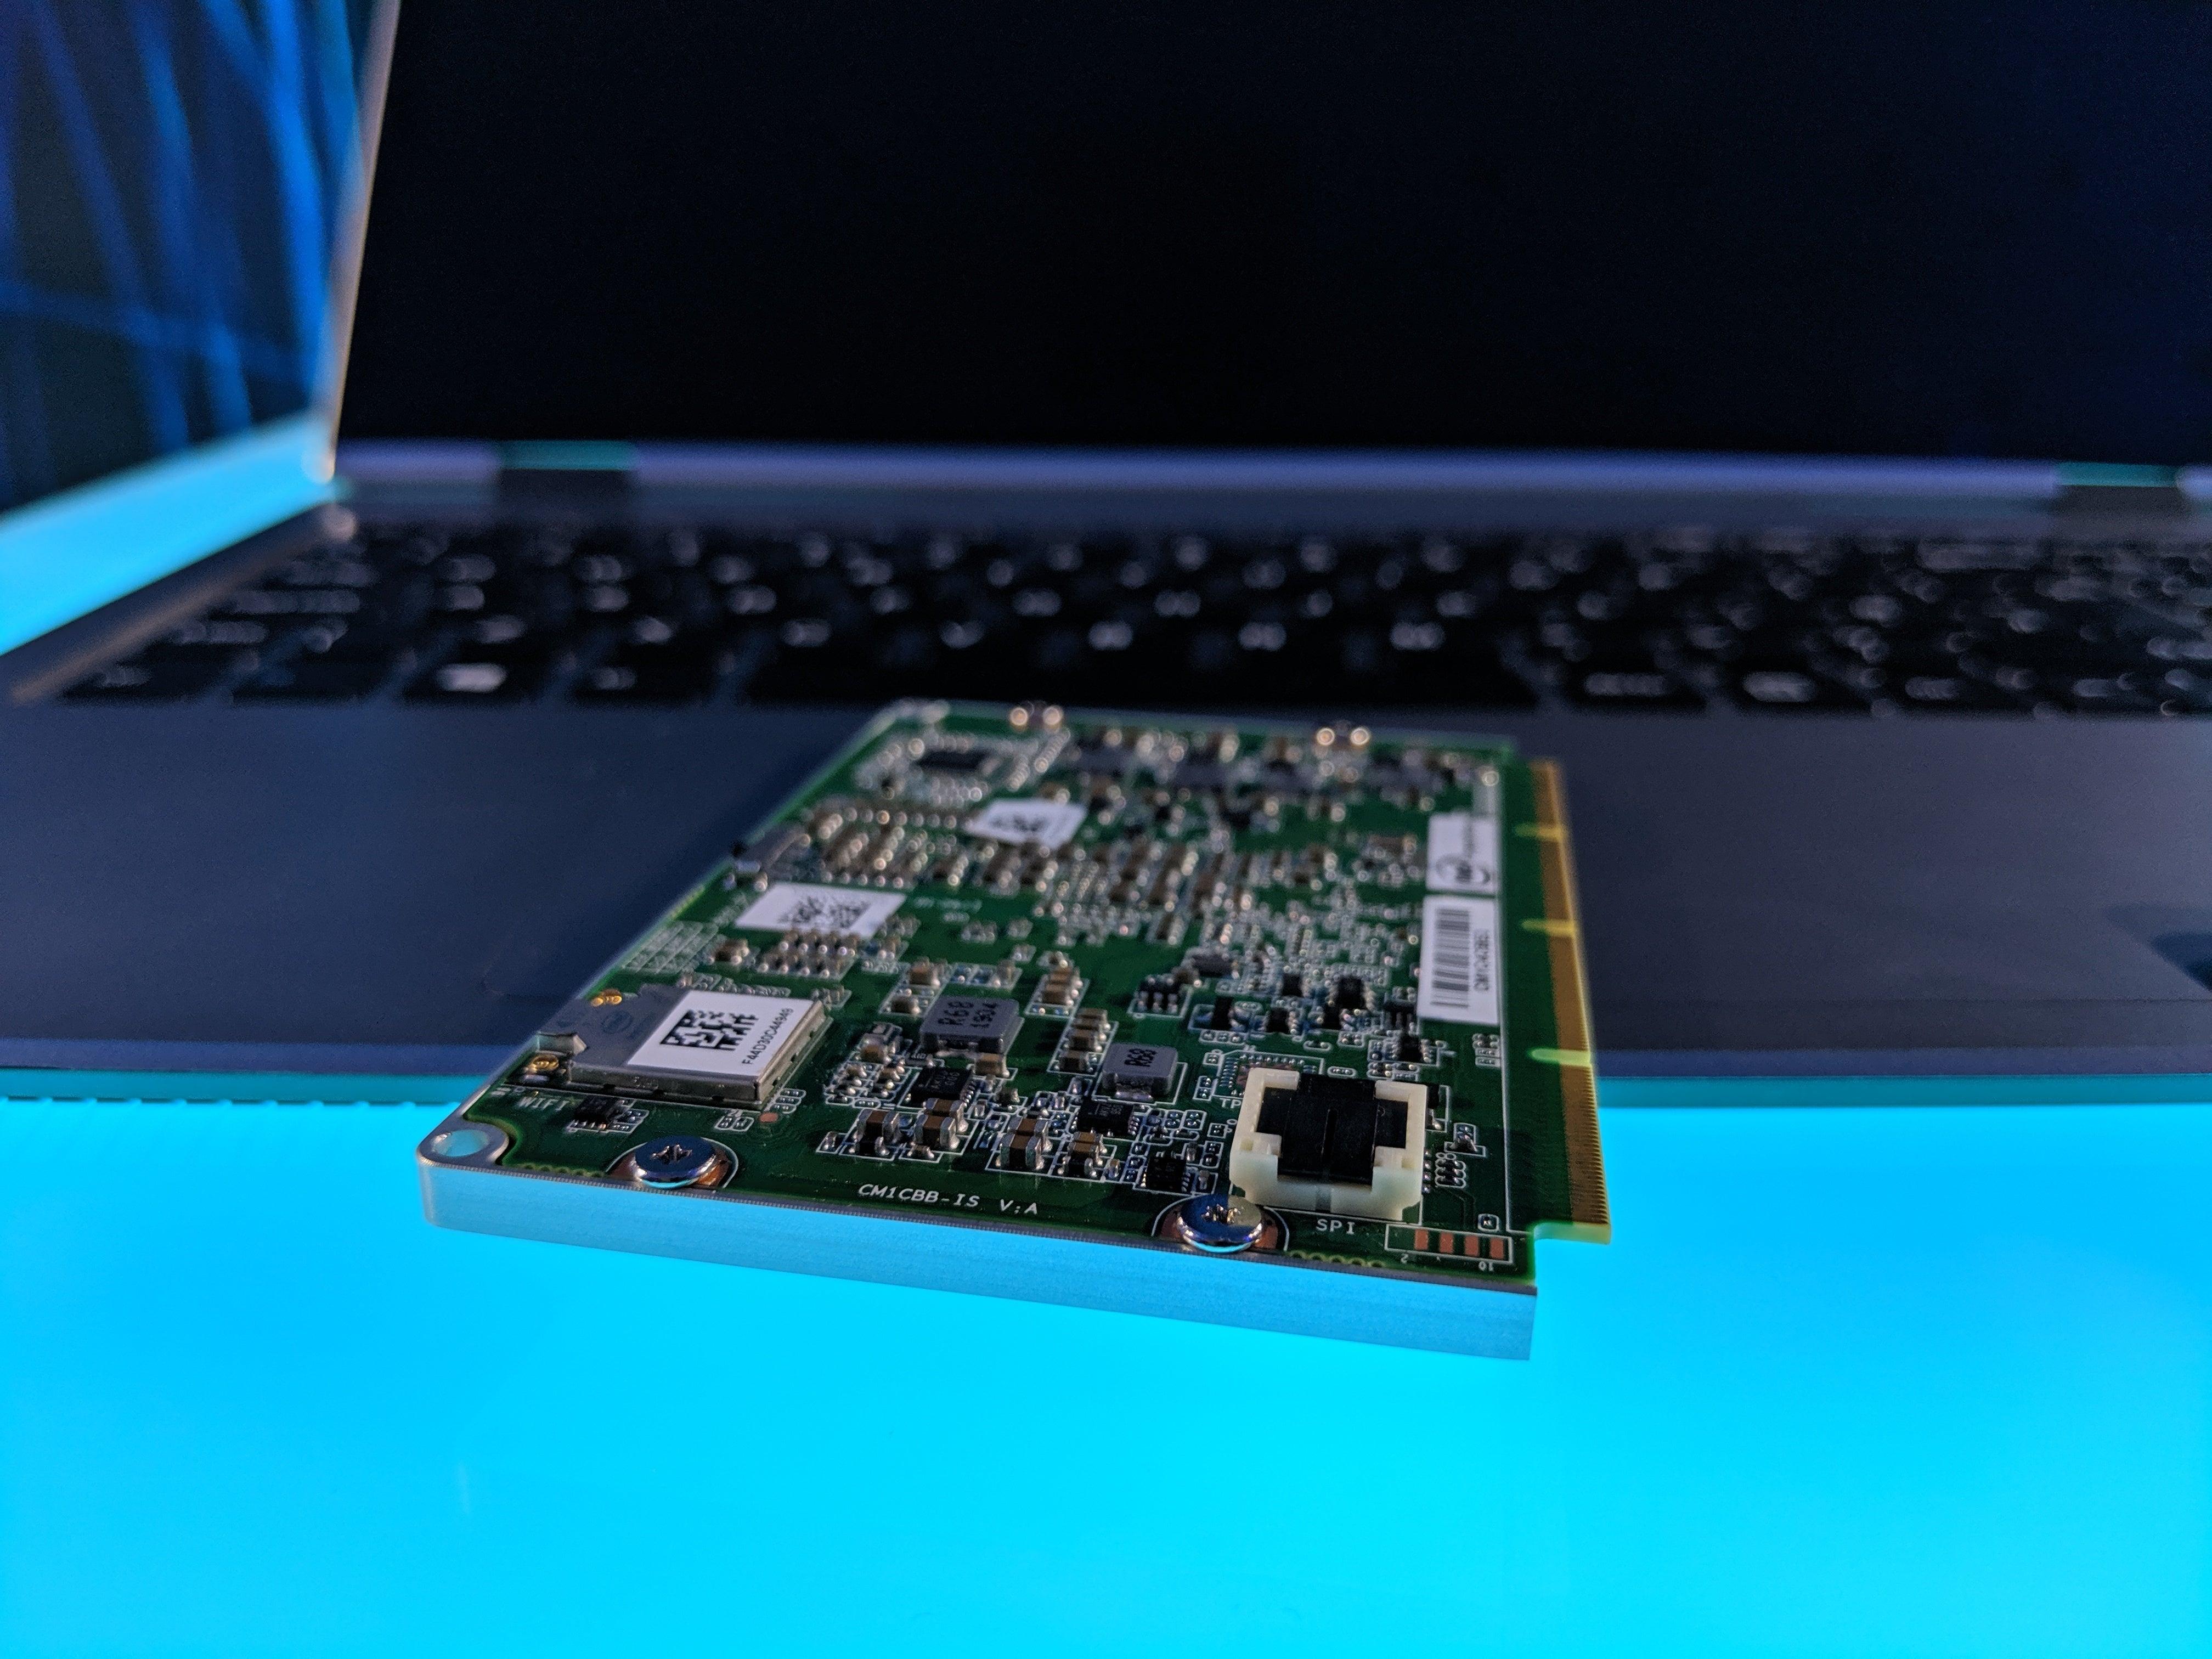 Intel's NUC Compute Elements hopes to make laptops modular